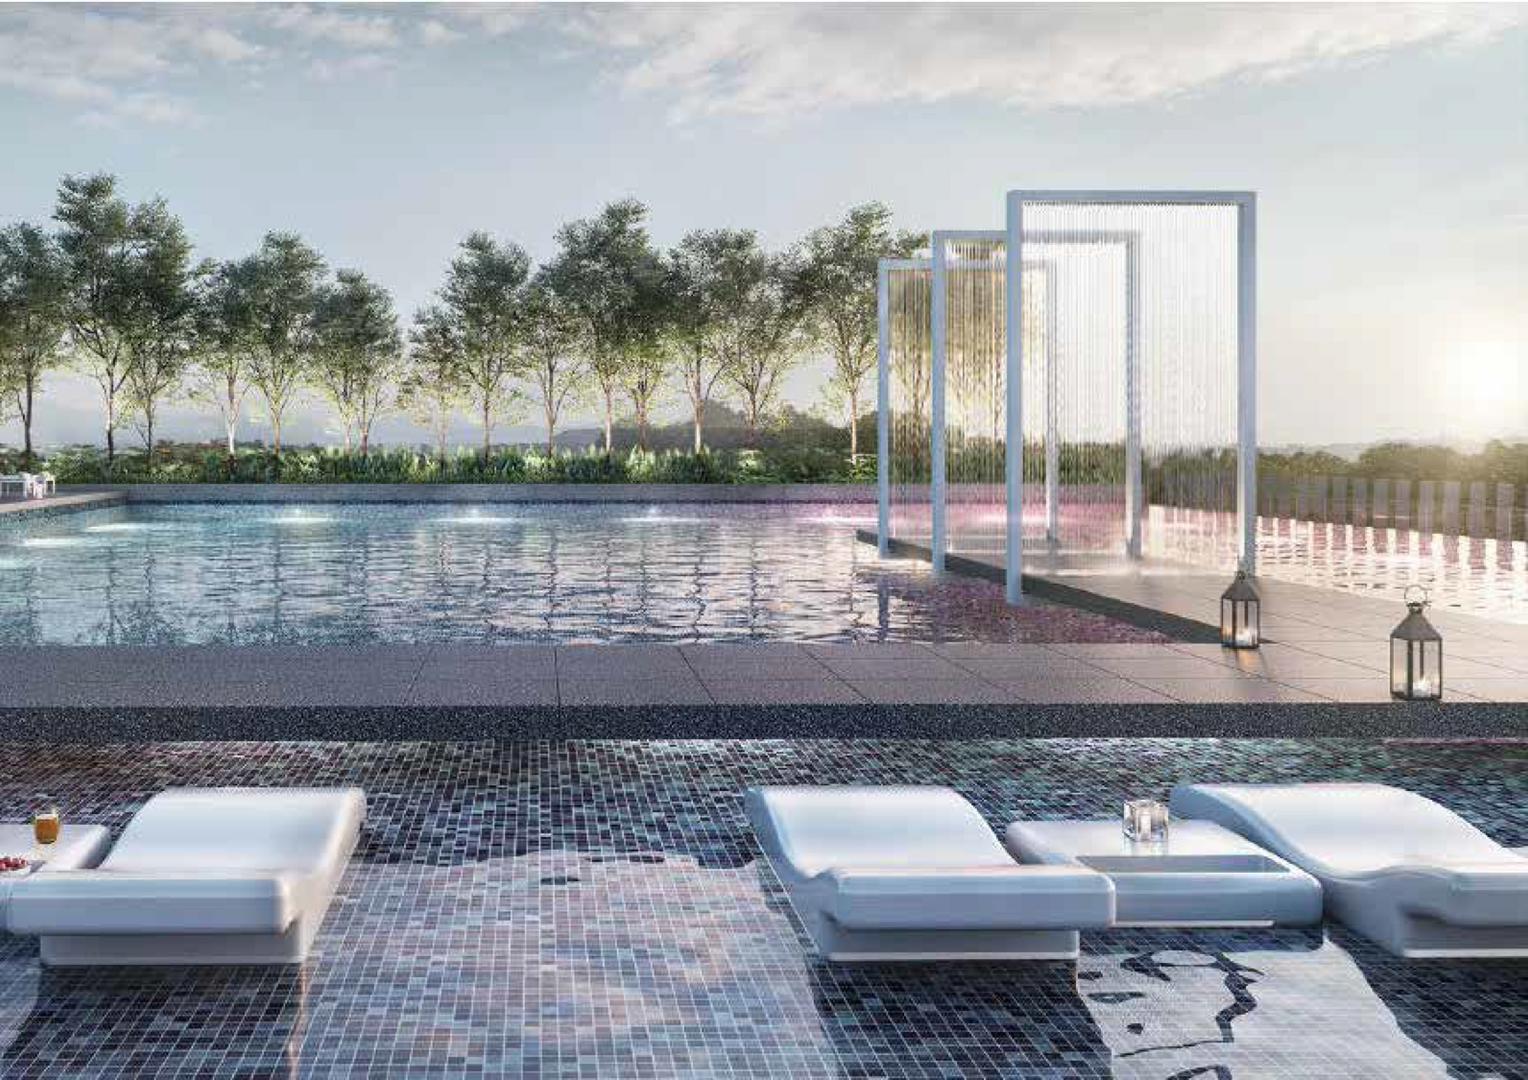 pentamont-facilities-infinity-edge-pool.